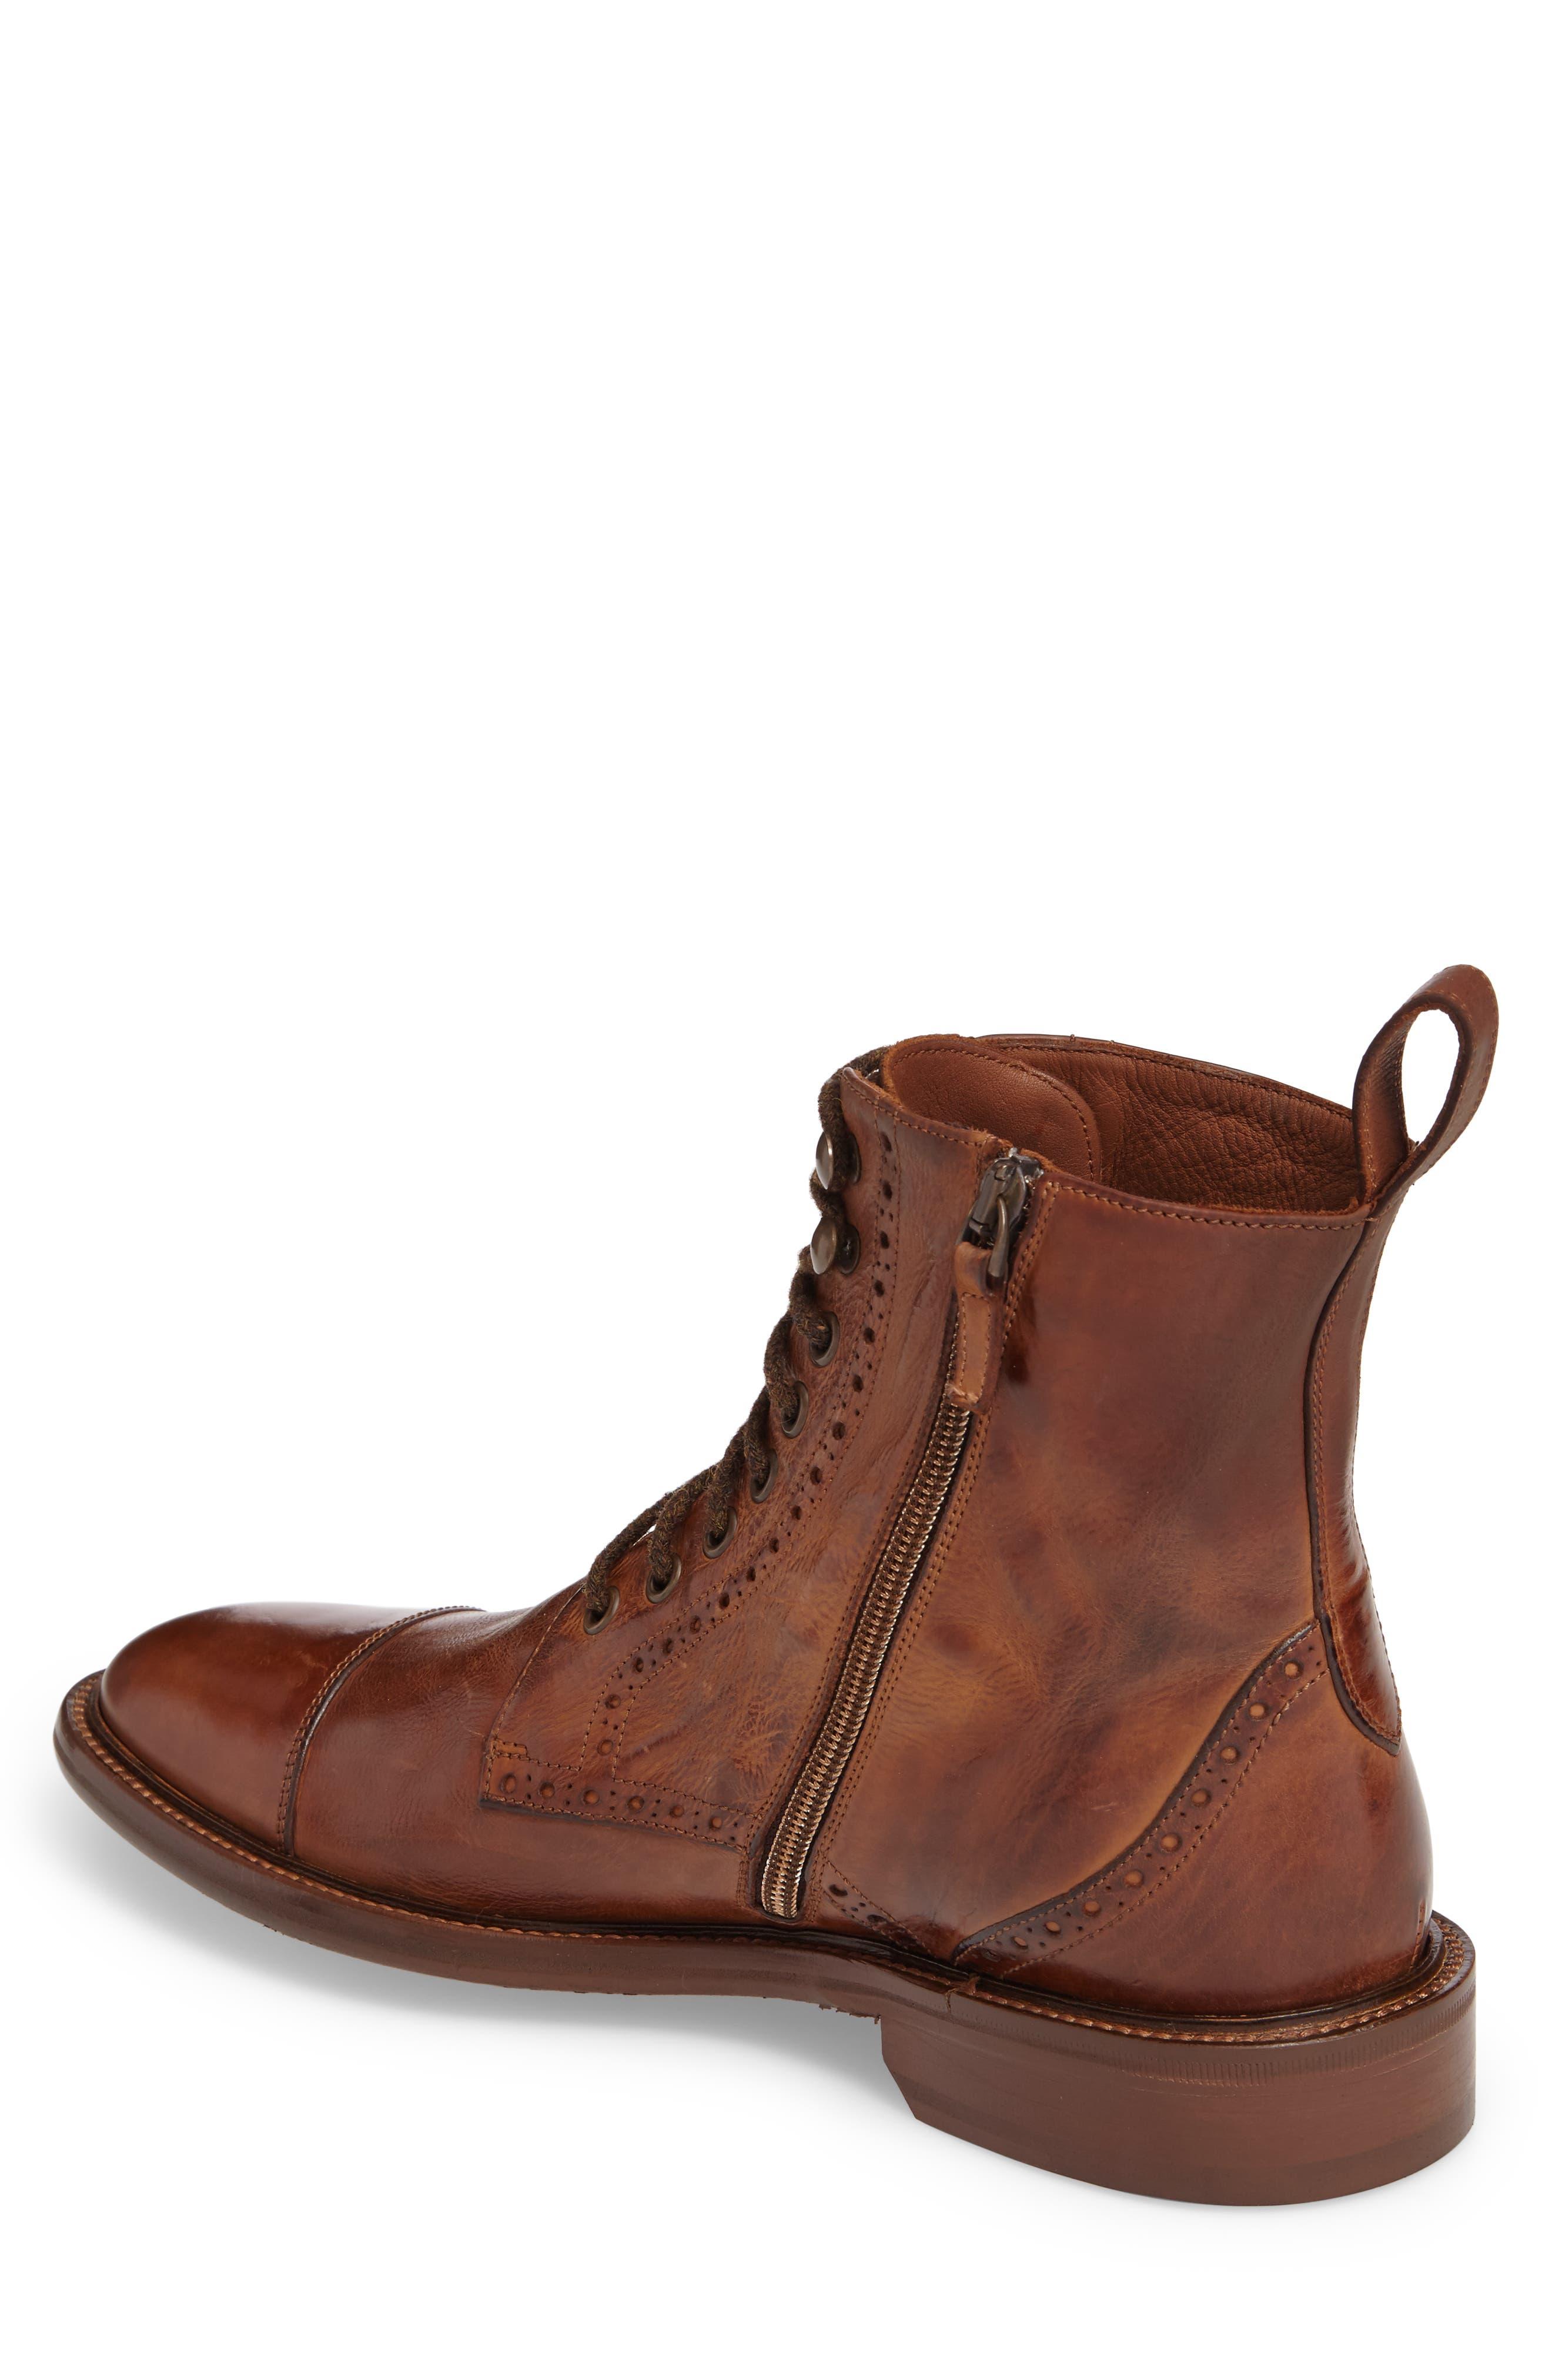 Bryson Cap Toe Boot,                             Alternate thumbnail 2, color,                             Mahogany Leather